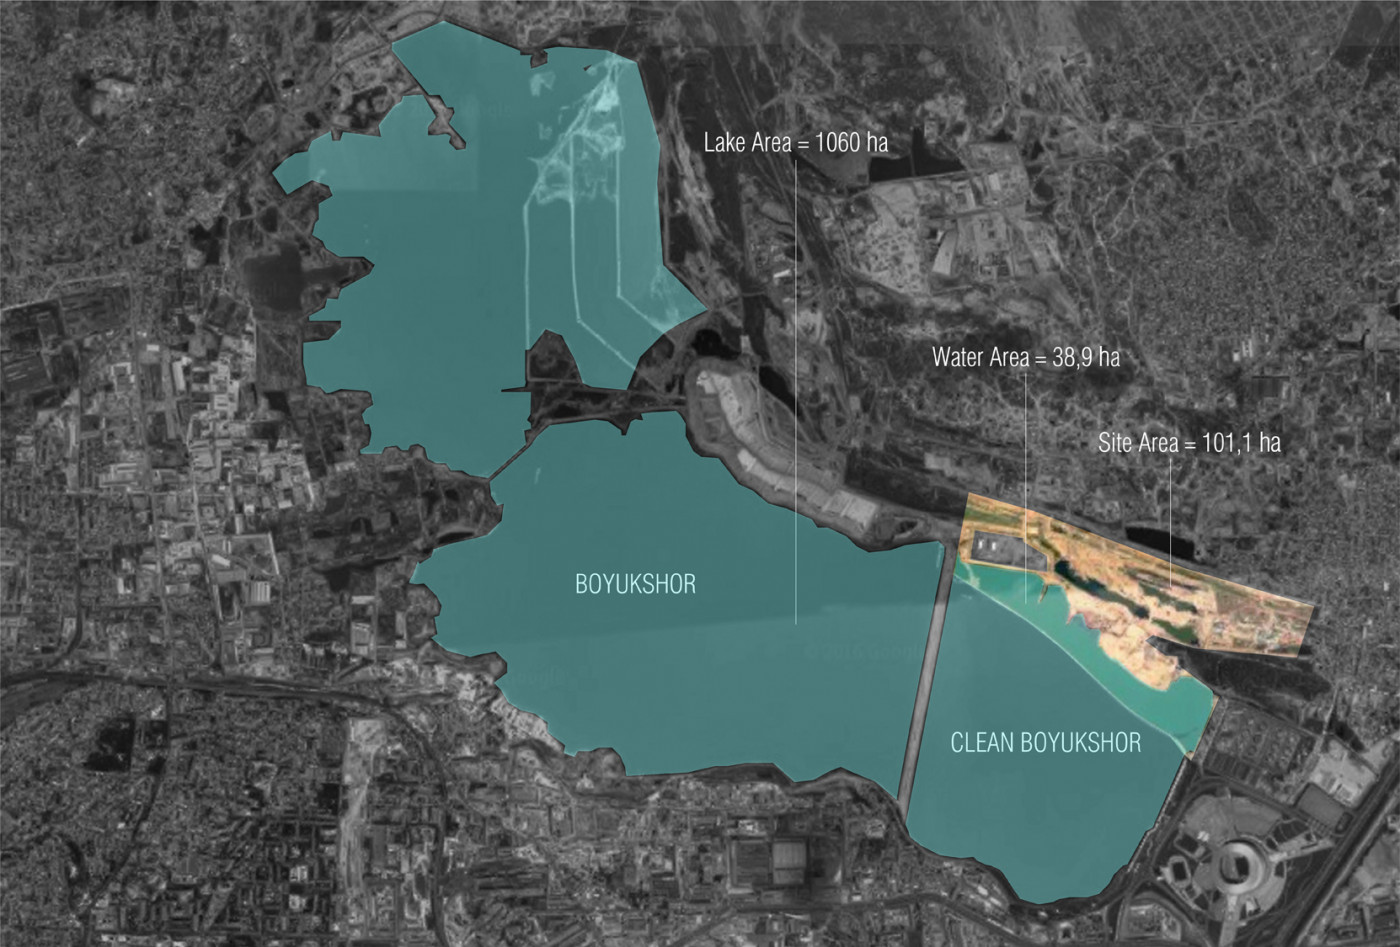 The lake and surroundings / Technopark on the territory of Boyukshor lake